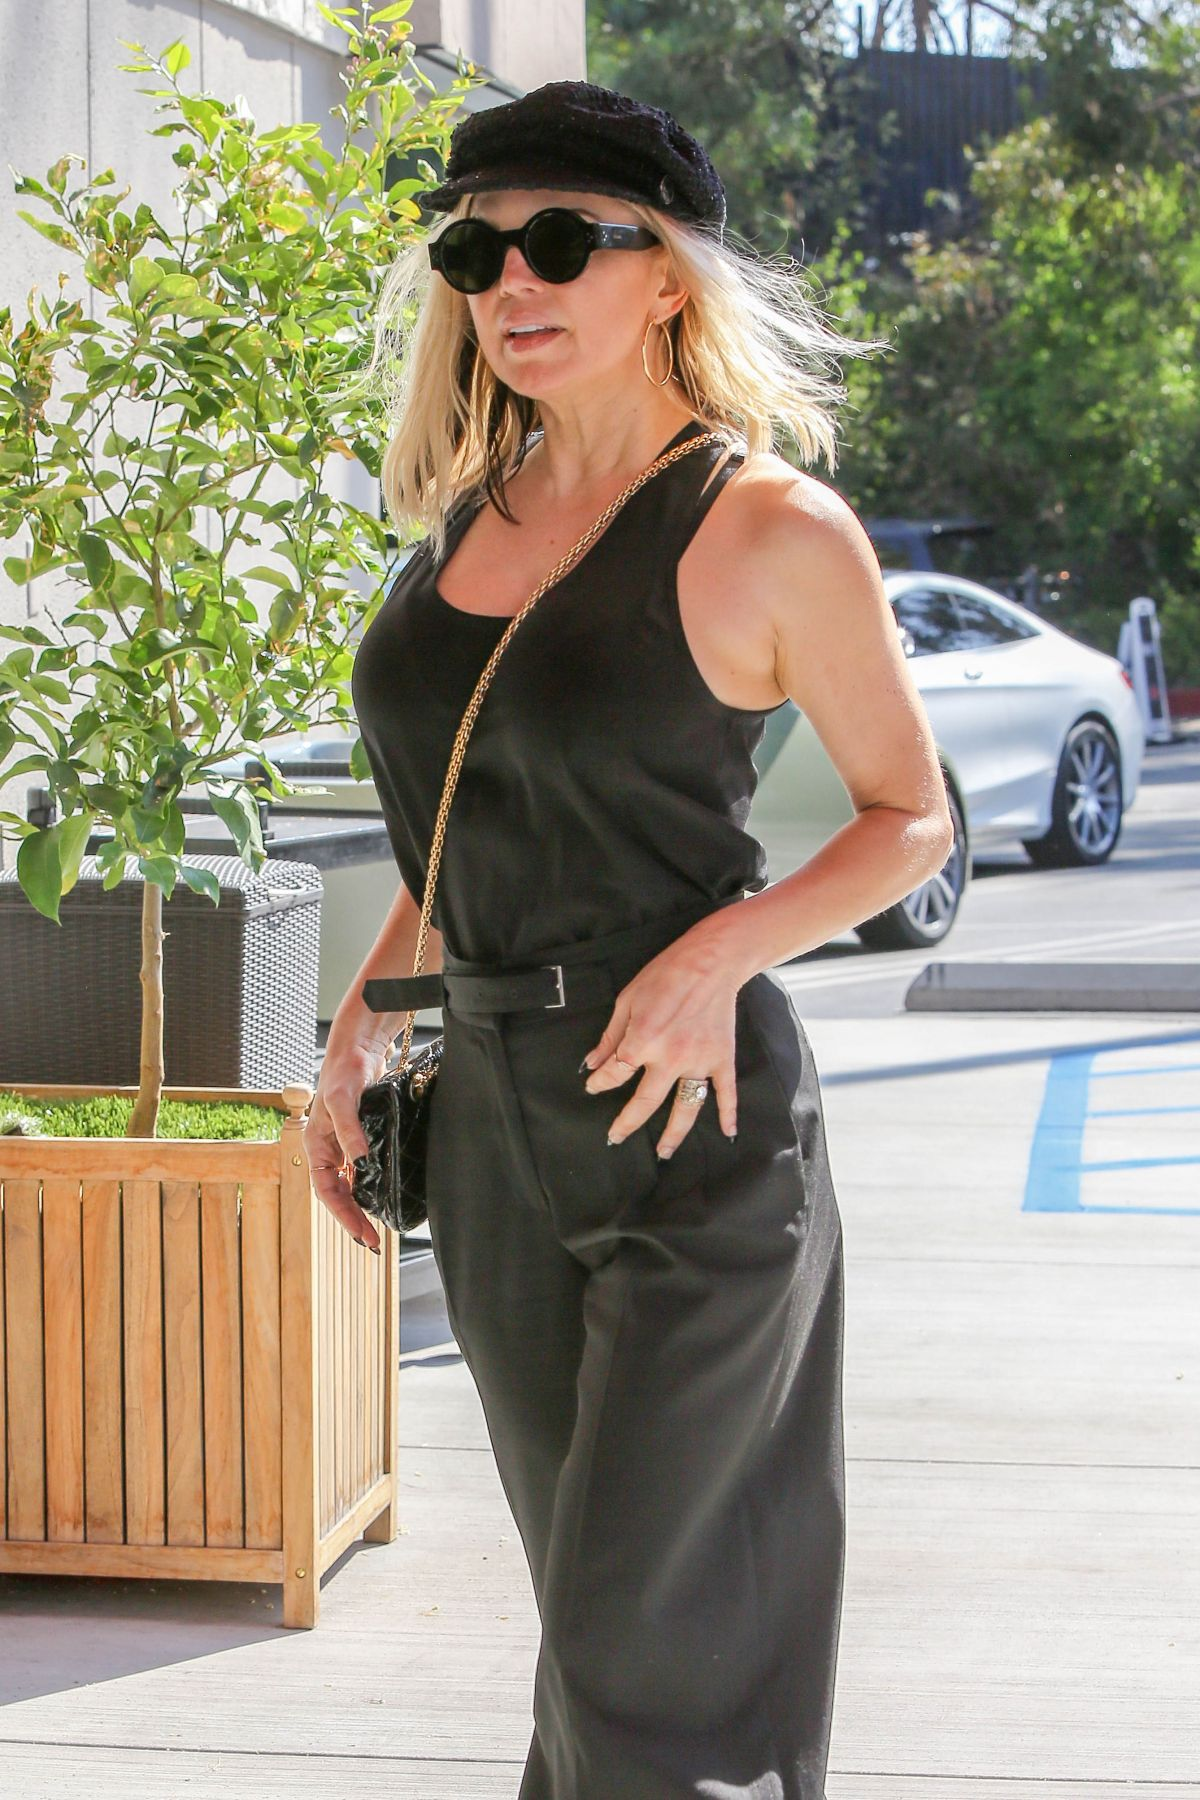 STACY FERGIE FERGUSON Arrives at a Meeting in Santa Monica 08/04/2016